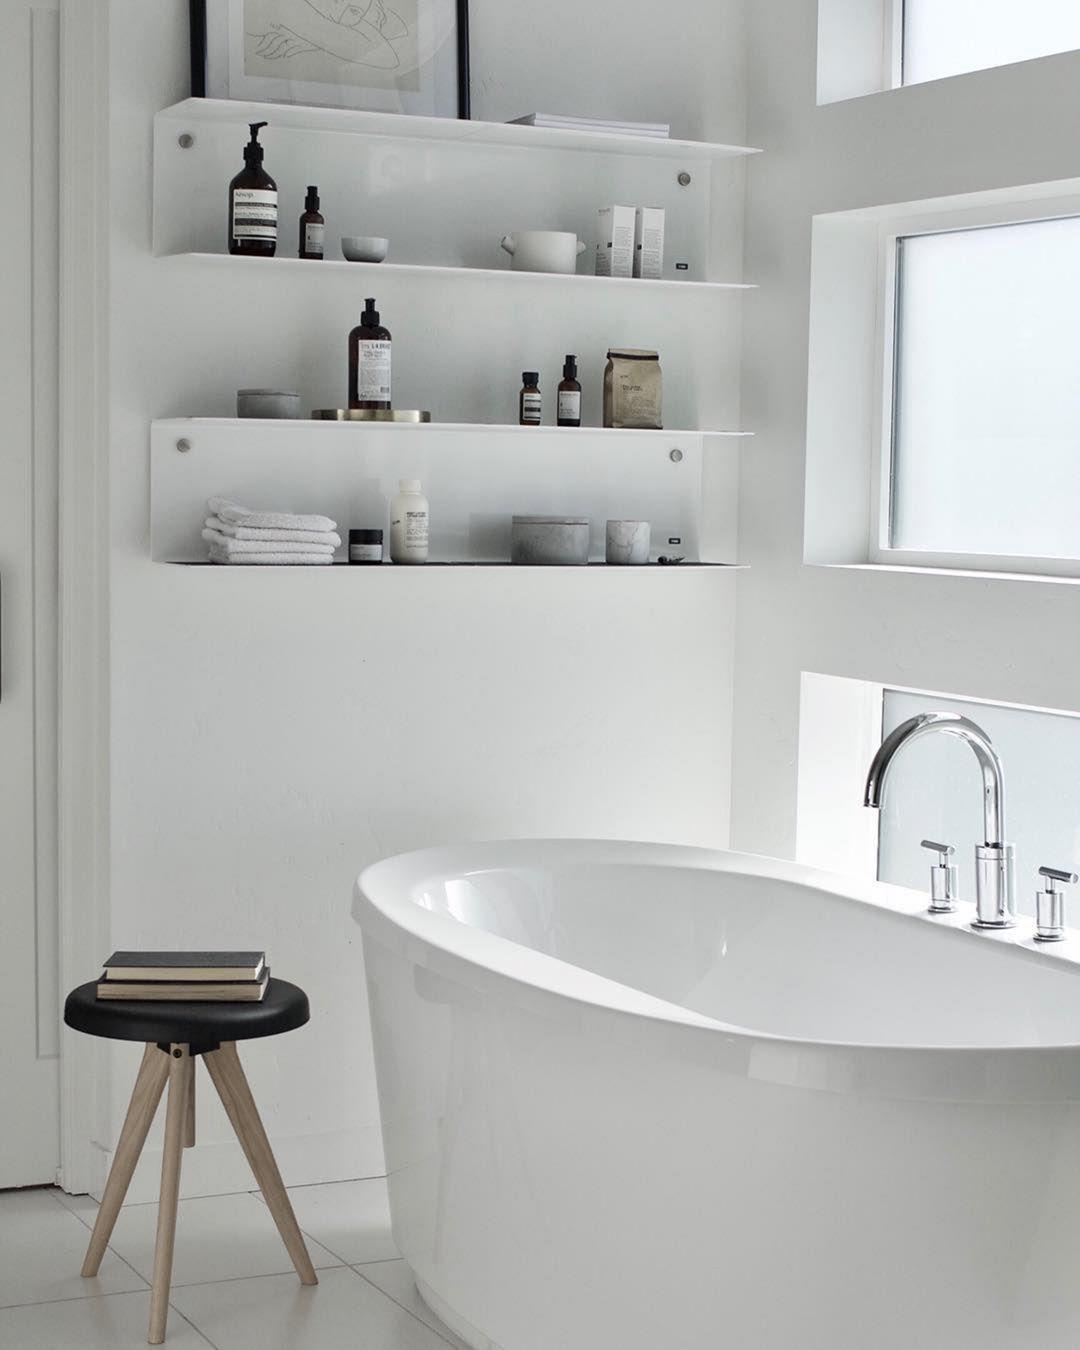 30 Beautiful Minimalist Bathroom Decorations Ideas To Inspire You Badezimmer Bad Styling Minimalistisches Badezimmer